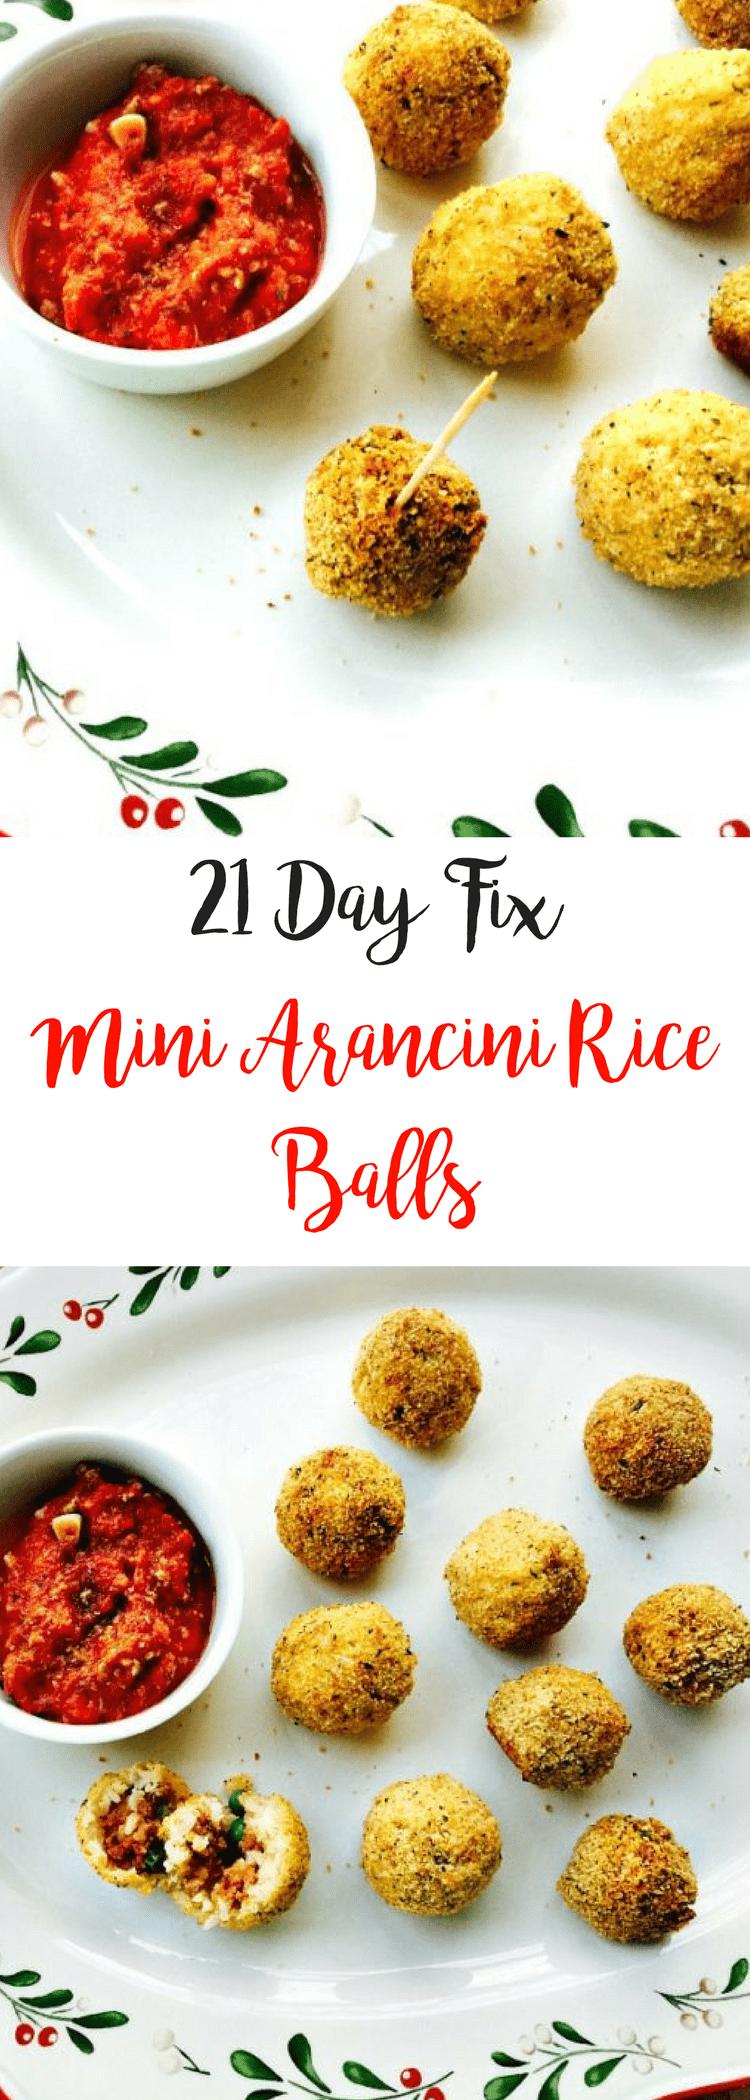 21 Day Fix Mini Arancini Rice Balls {Gluten-free} | Confessions of a Fit Foodie